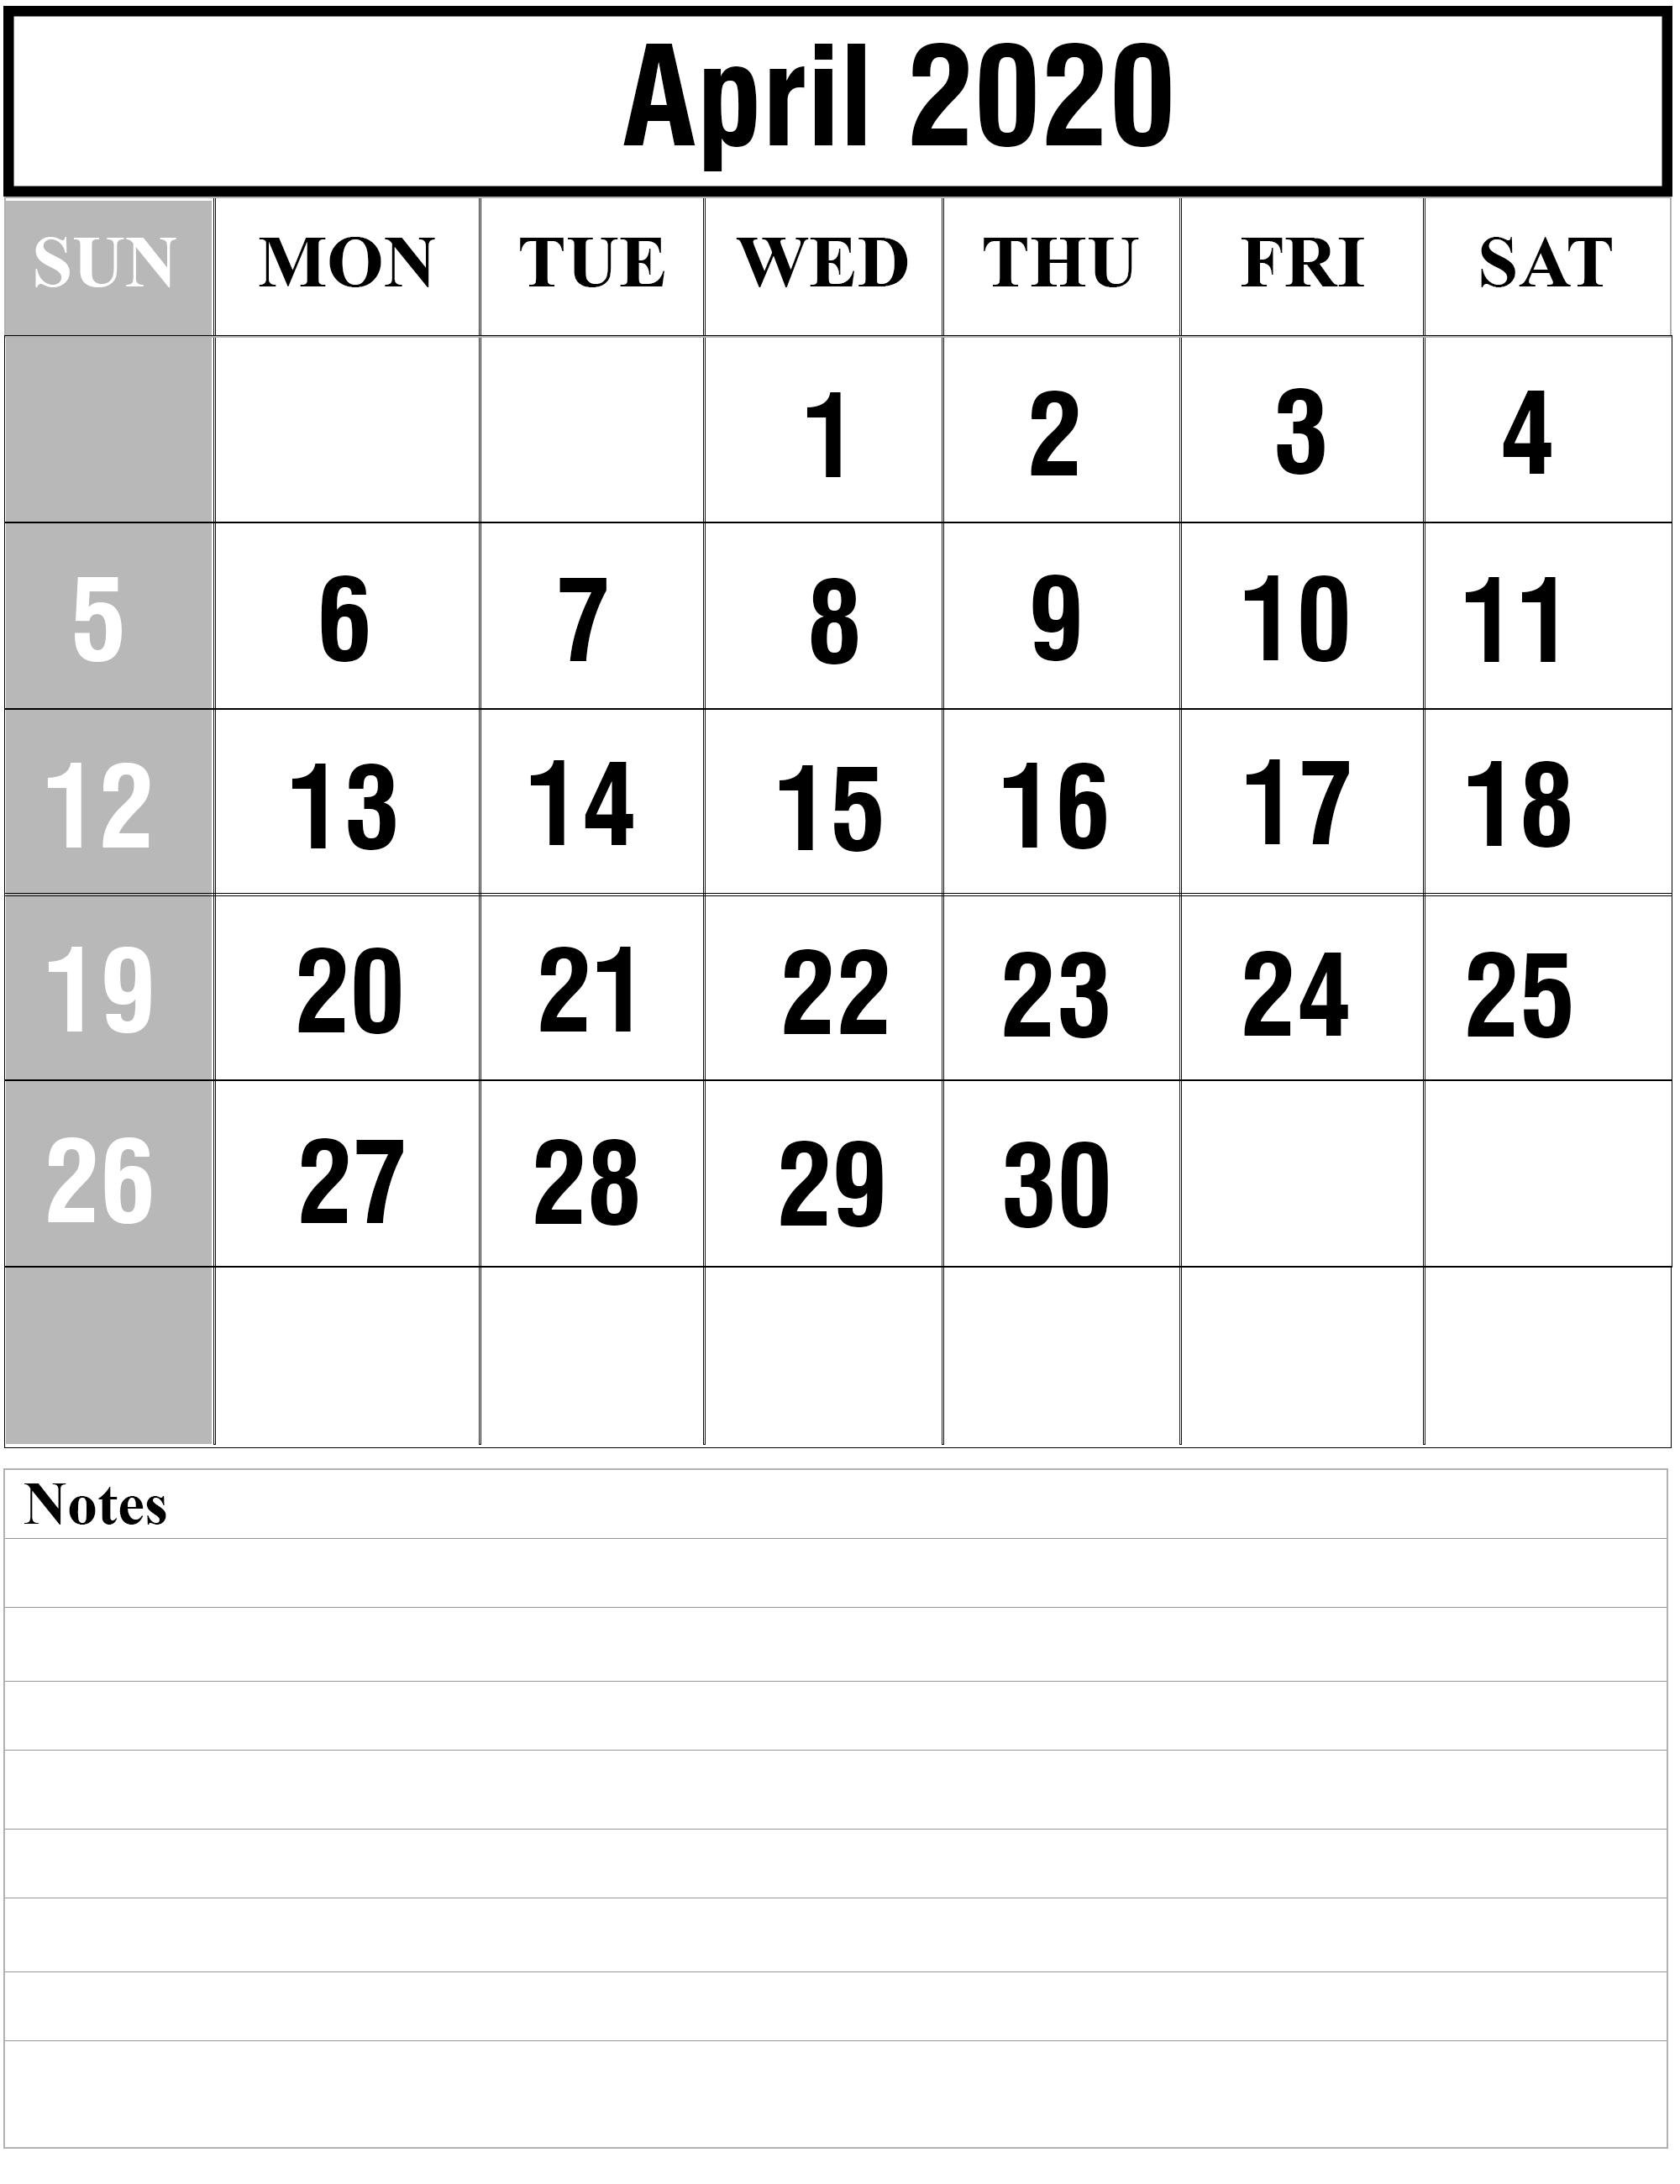 Free April 2020 Printable Calendar Template With Holidays [Pdf intended for Calendar 2020 Pdf Romania